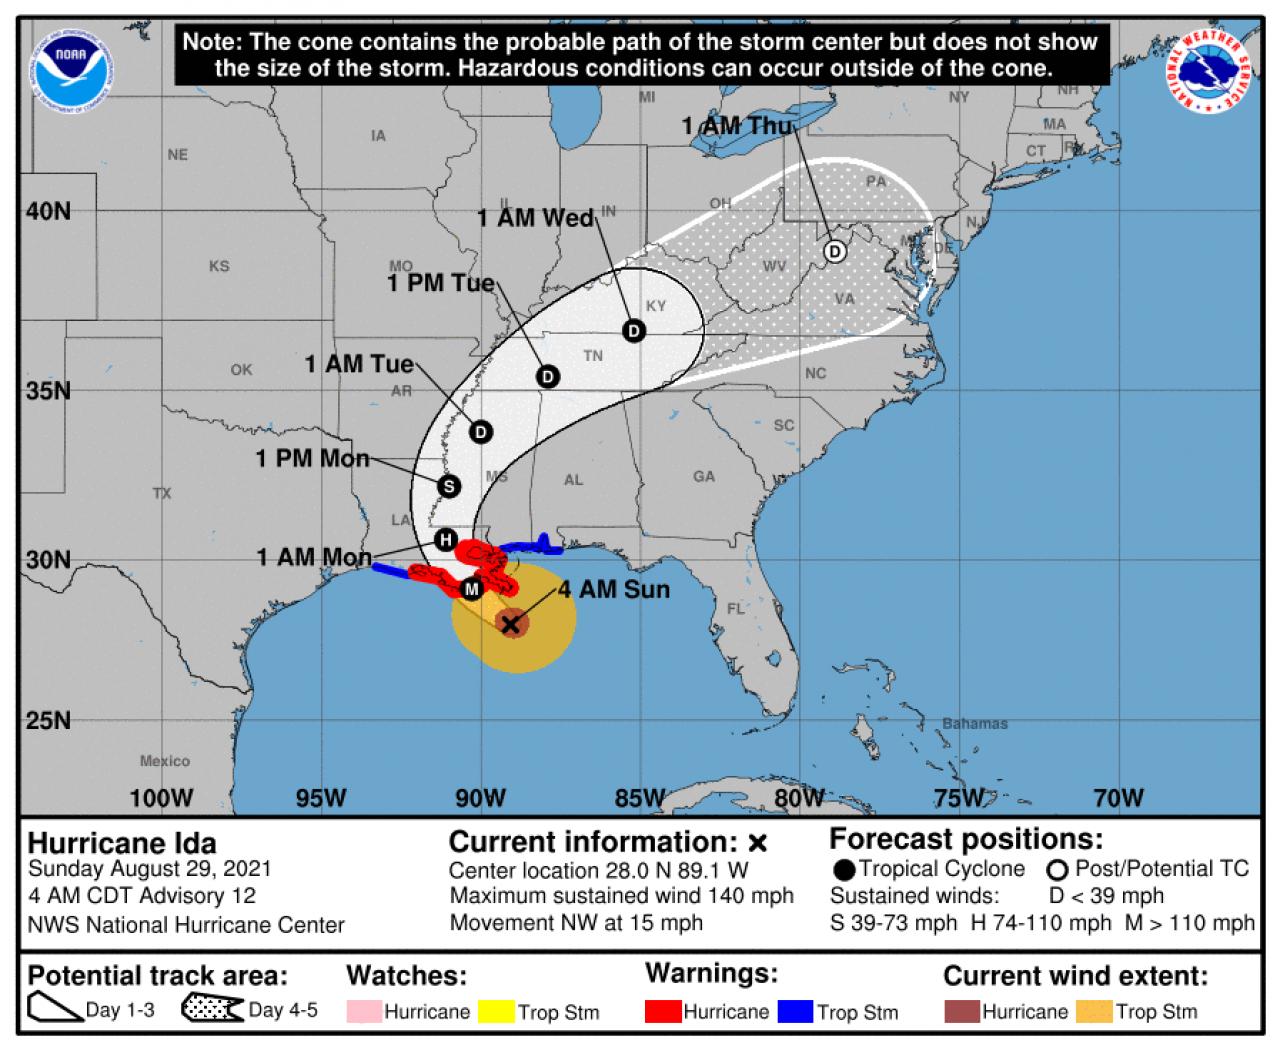 Traiettoria prevista di Ida. fonte : NOAA